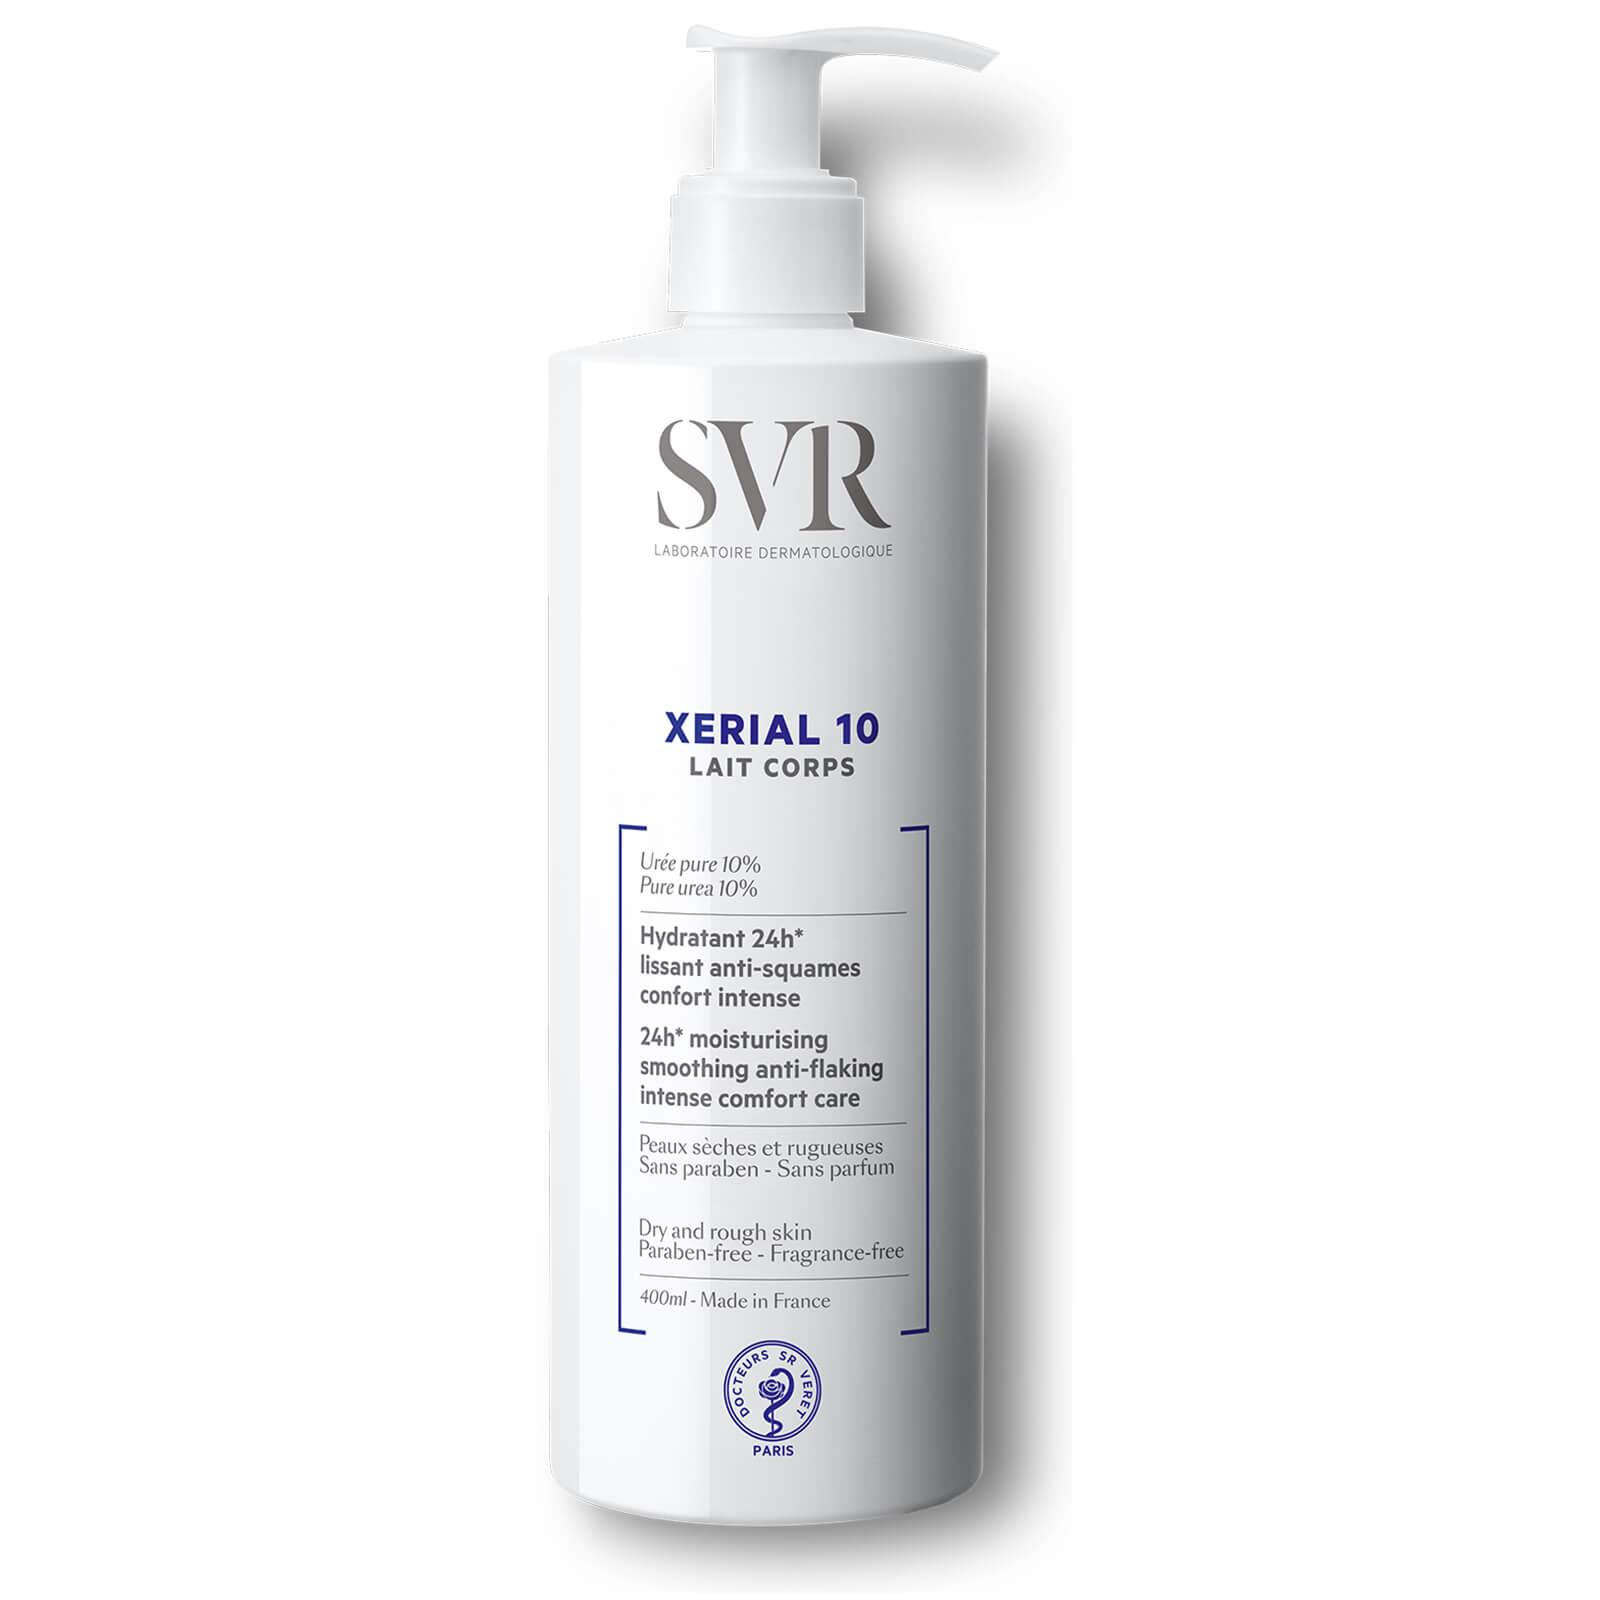 Купить Молочко для сухой и шелушащейся кожи тела SVR Laboratoires XERIAL 10 Lait Corps Body Milk 400 мл